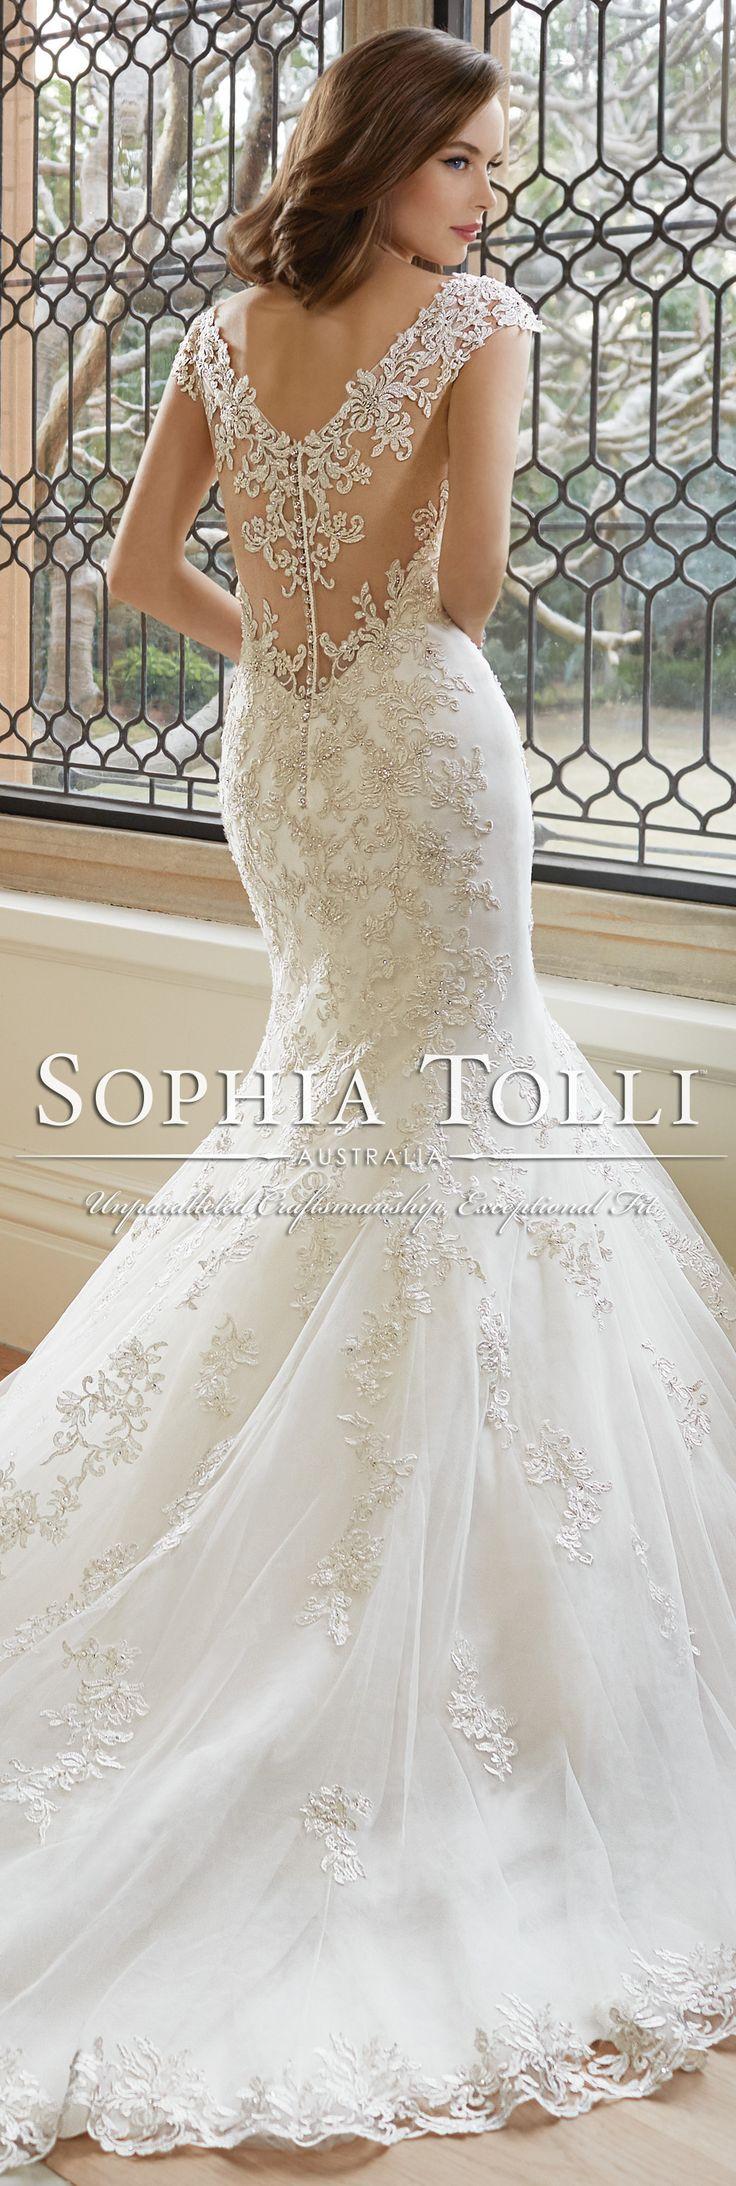 The Sophia Tolli Spring 2016 Wedding Dress Collection - Style No. Y11646 - Rana #laceweddingdress